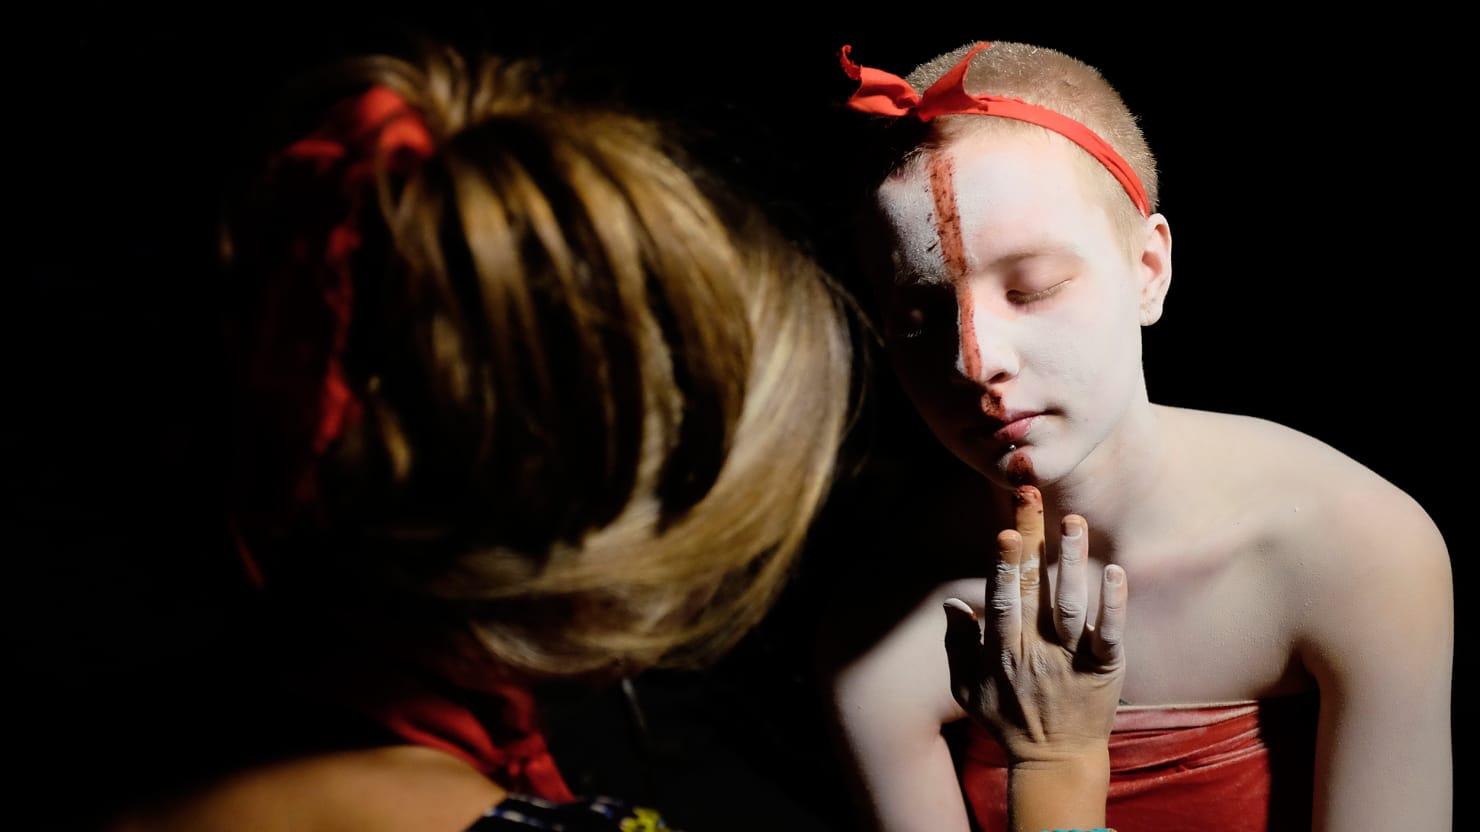 Haglage Costa Rica Tease Otqguw Hallucinating Addiction